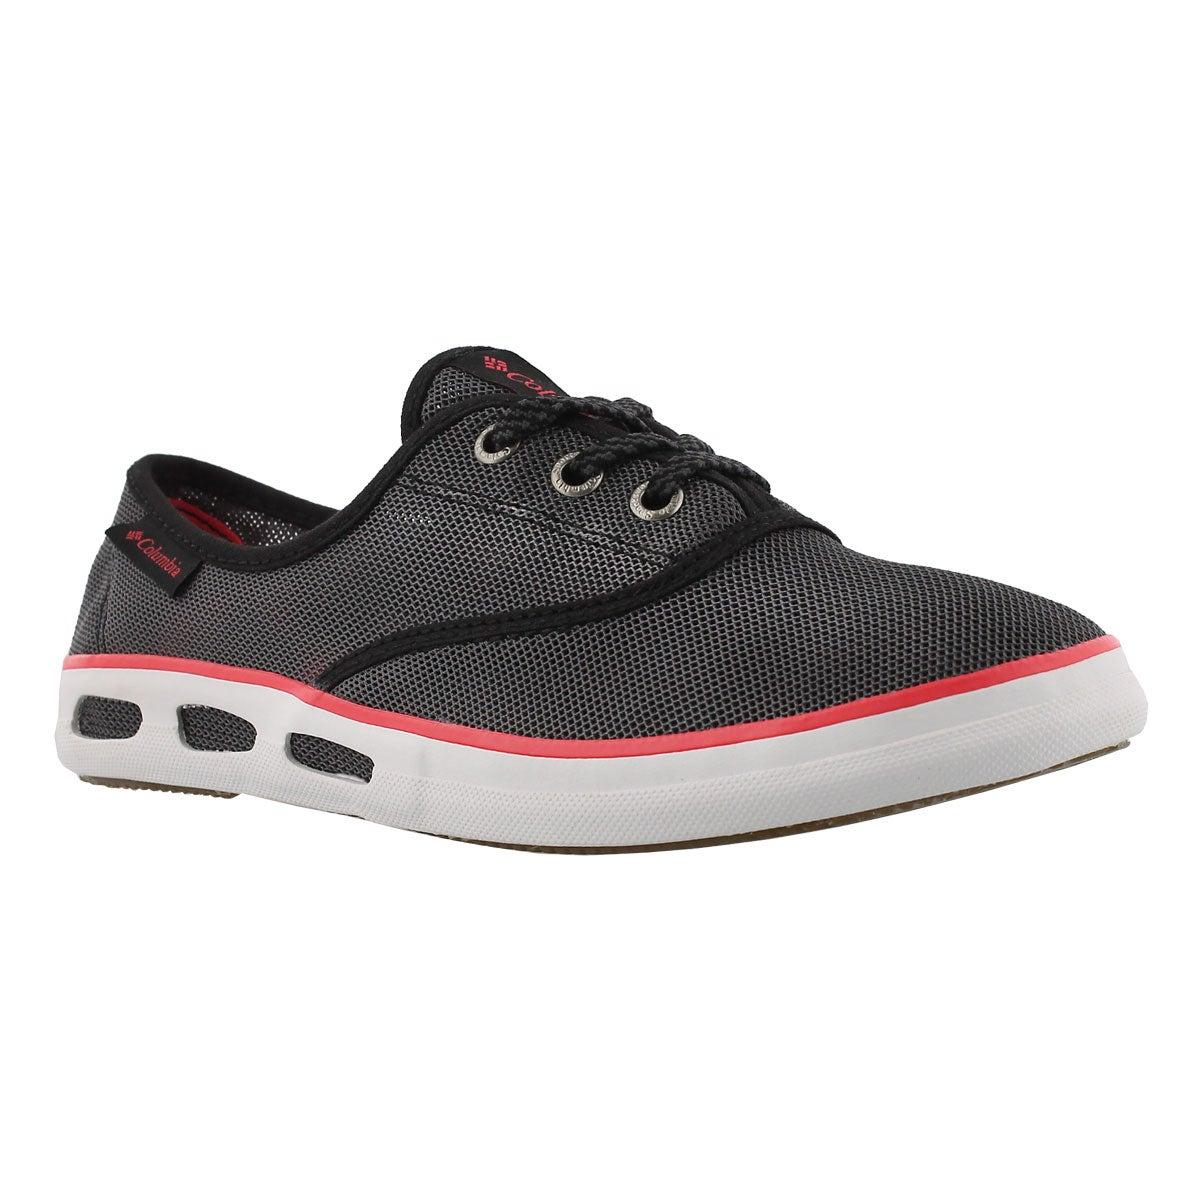 Lds Vulc N Vent Lace Mesh black sneaker